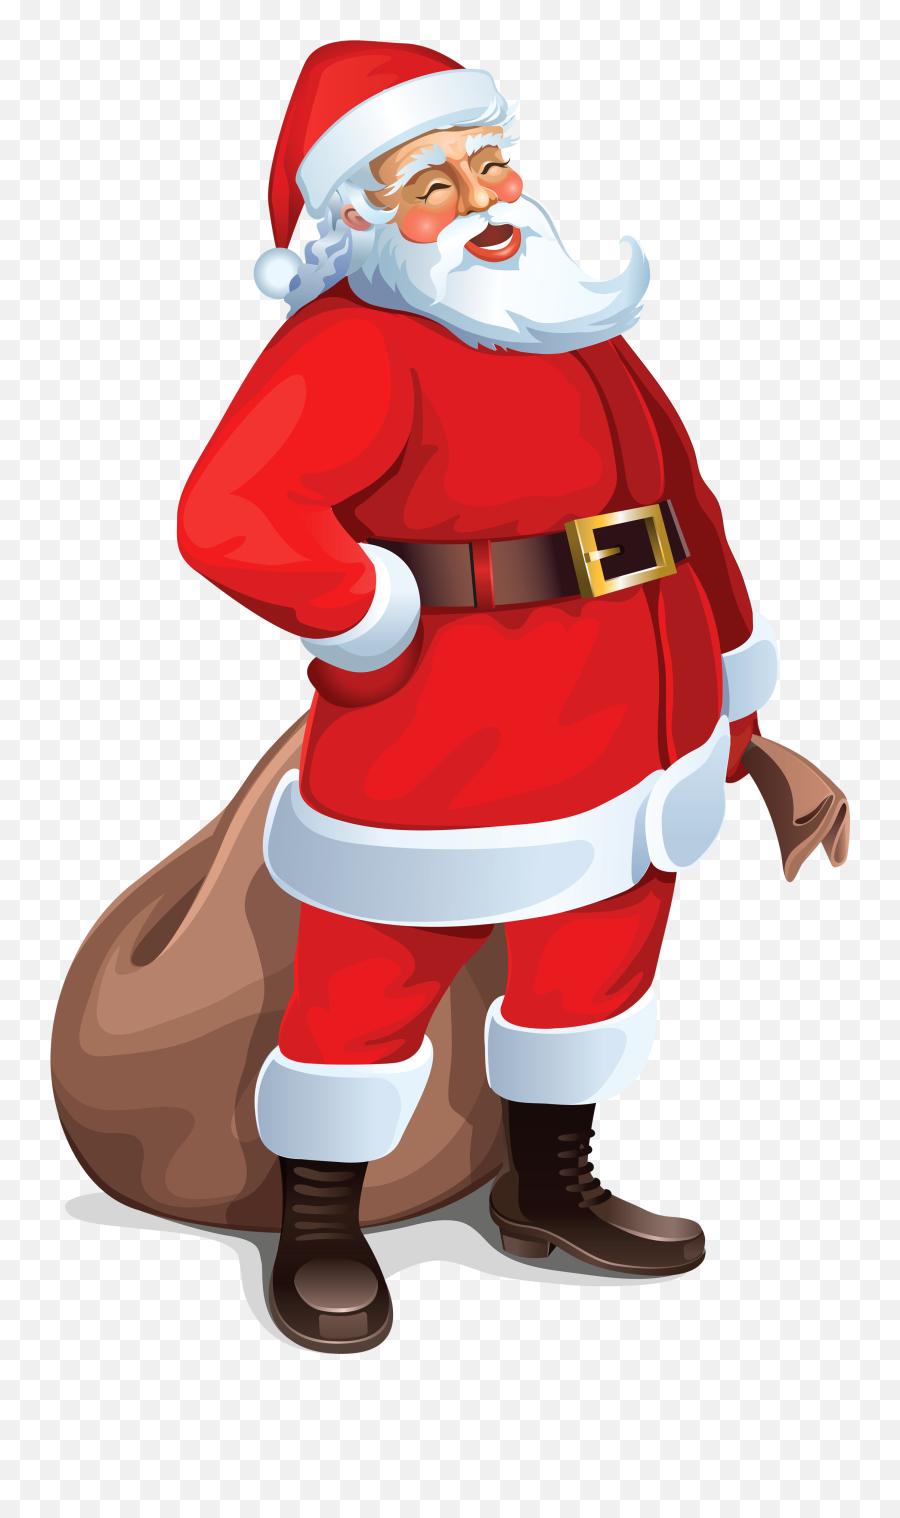 Sad Santa Transparent Png Clipart Free Download Emoji,Black Santa Emoji